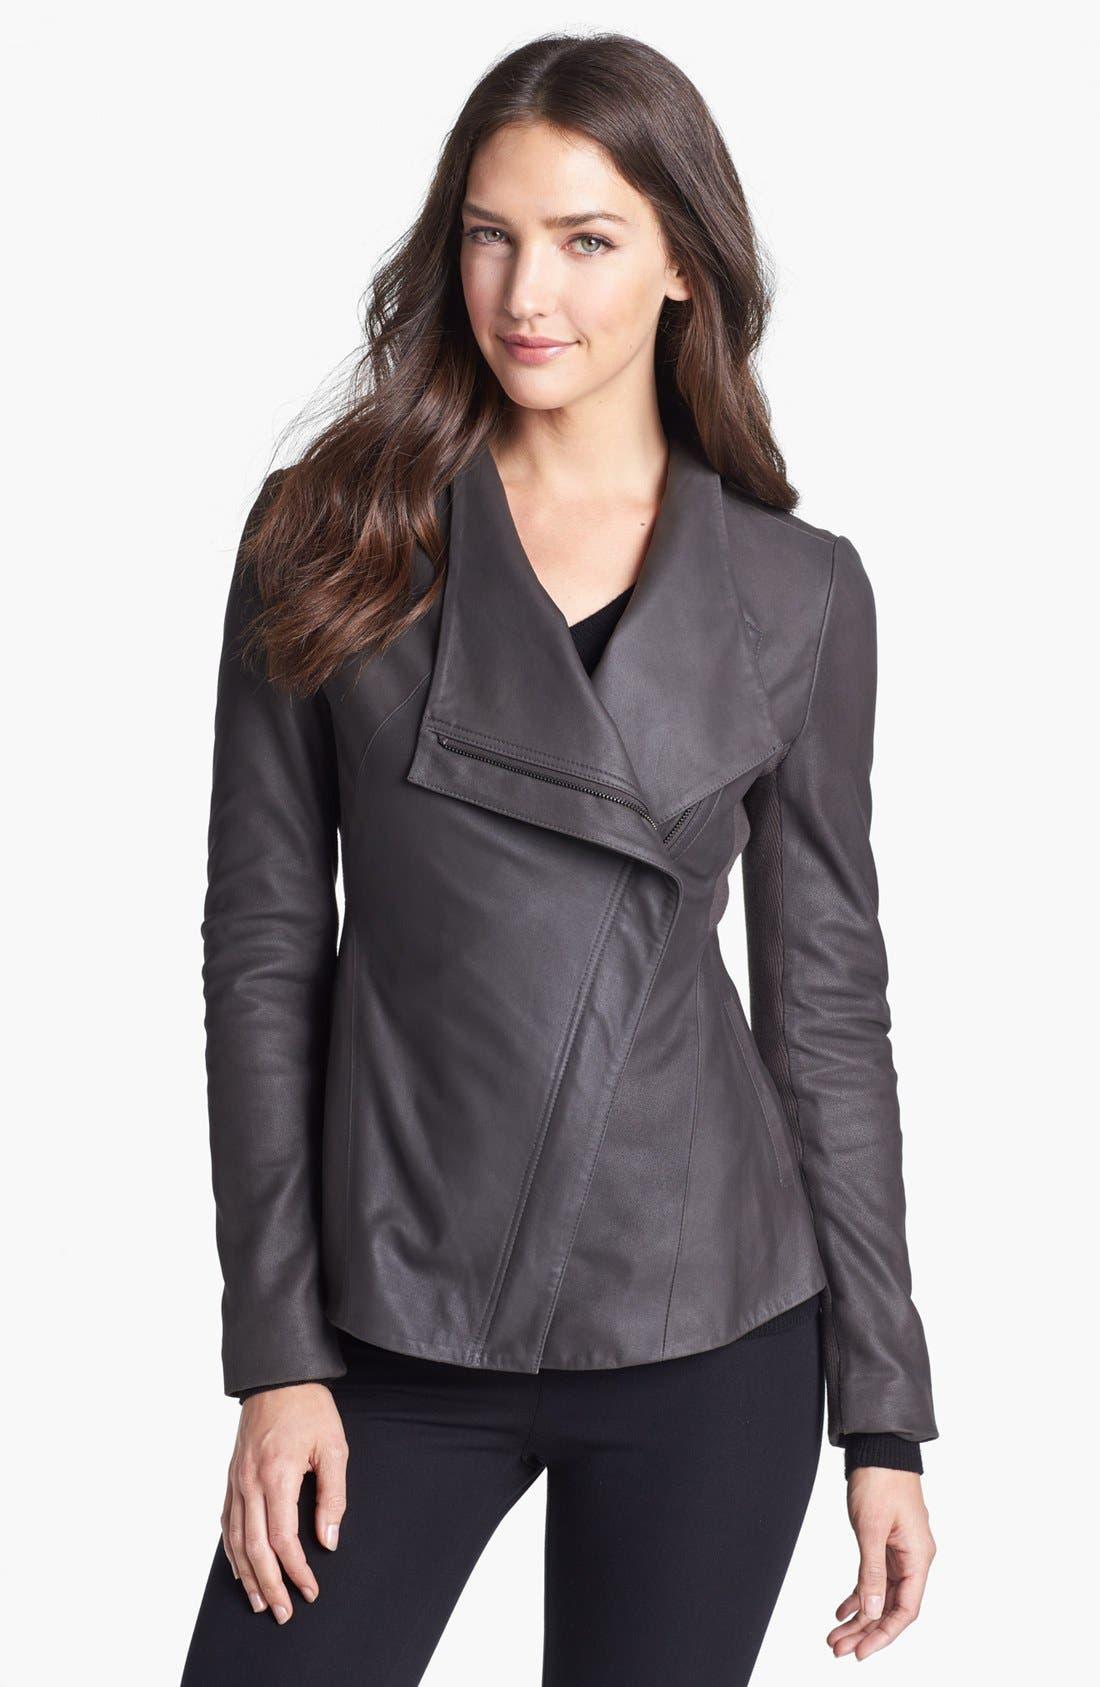 Alternate Image 1 Selected - Elie Tahari 'Constance' Peplum Back Leather Jacket